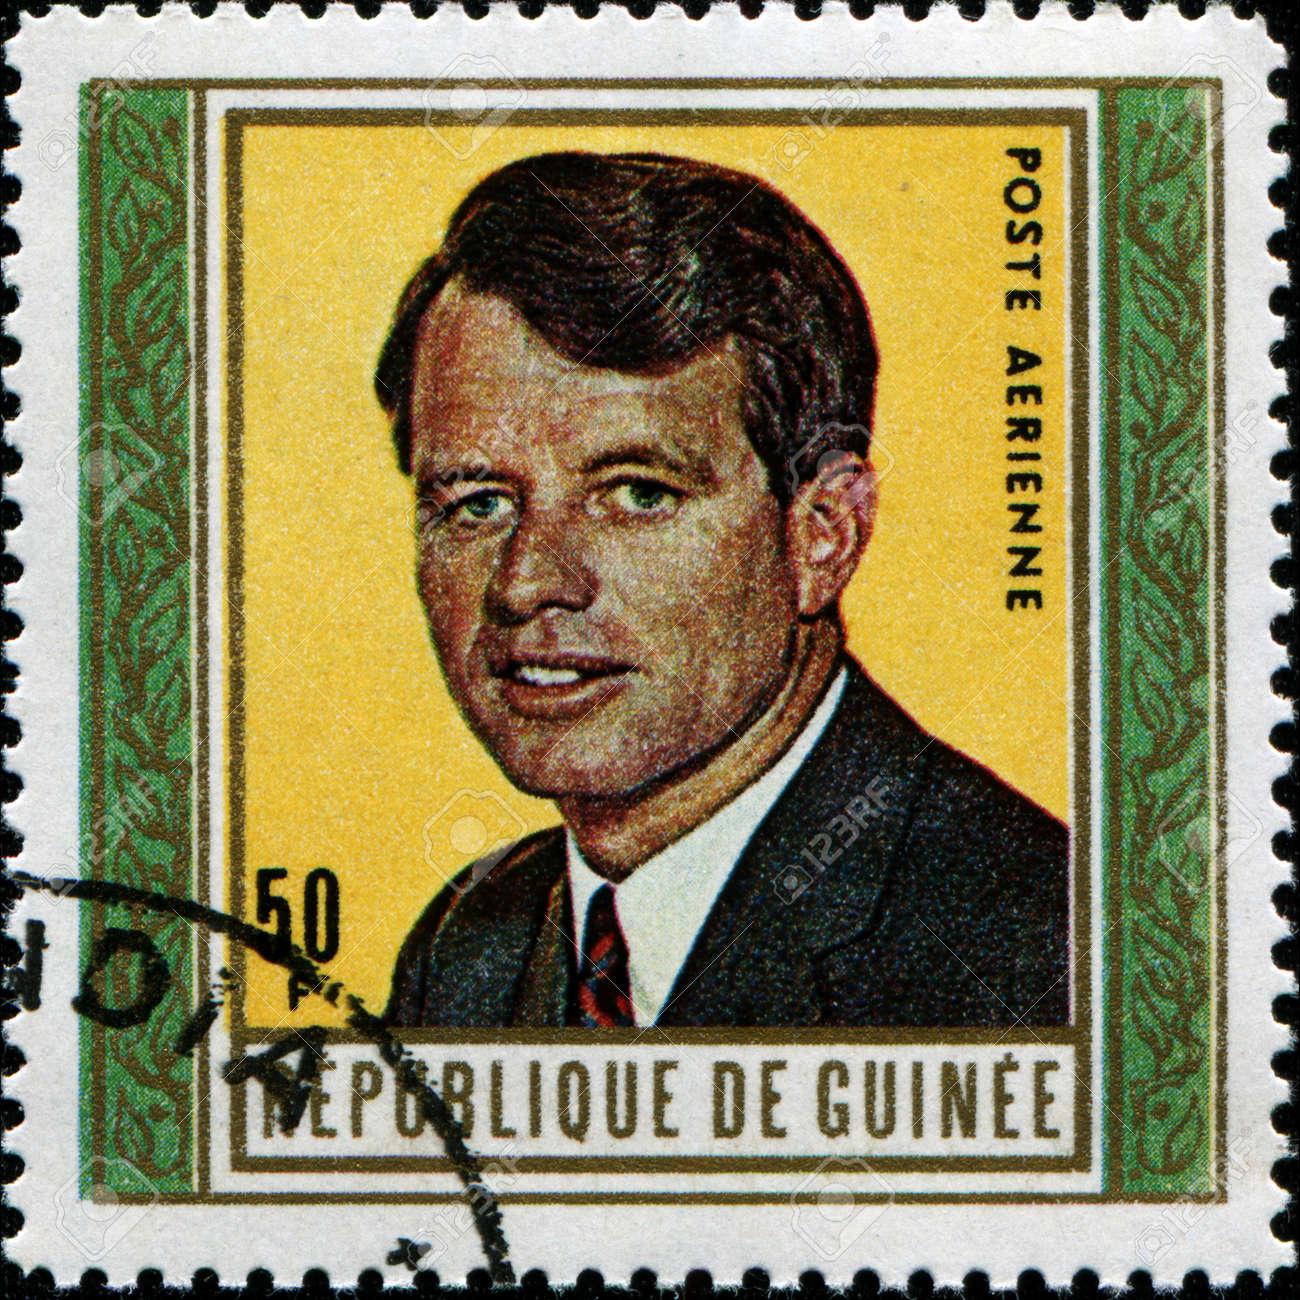 GUINEA - CIRCA 1969  A stamp printed in Guinea shows JRobert Kennedy, circa 1969 Stock Photo - 14200608